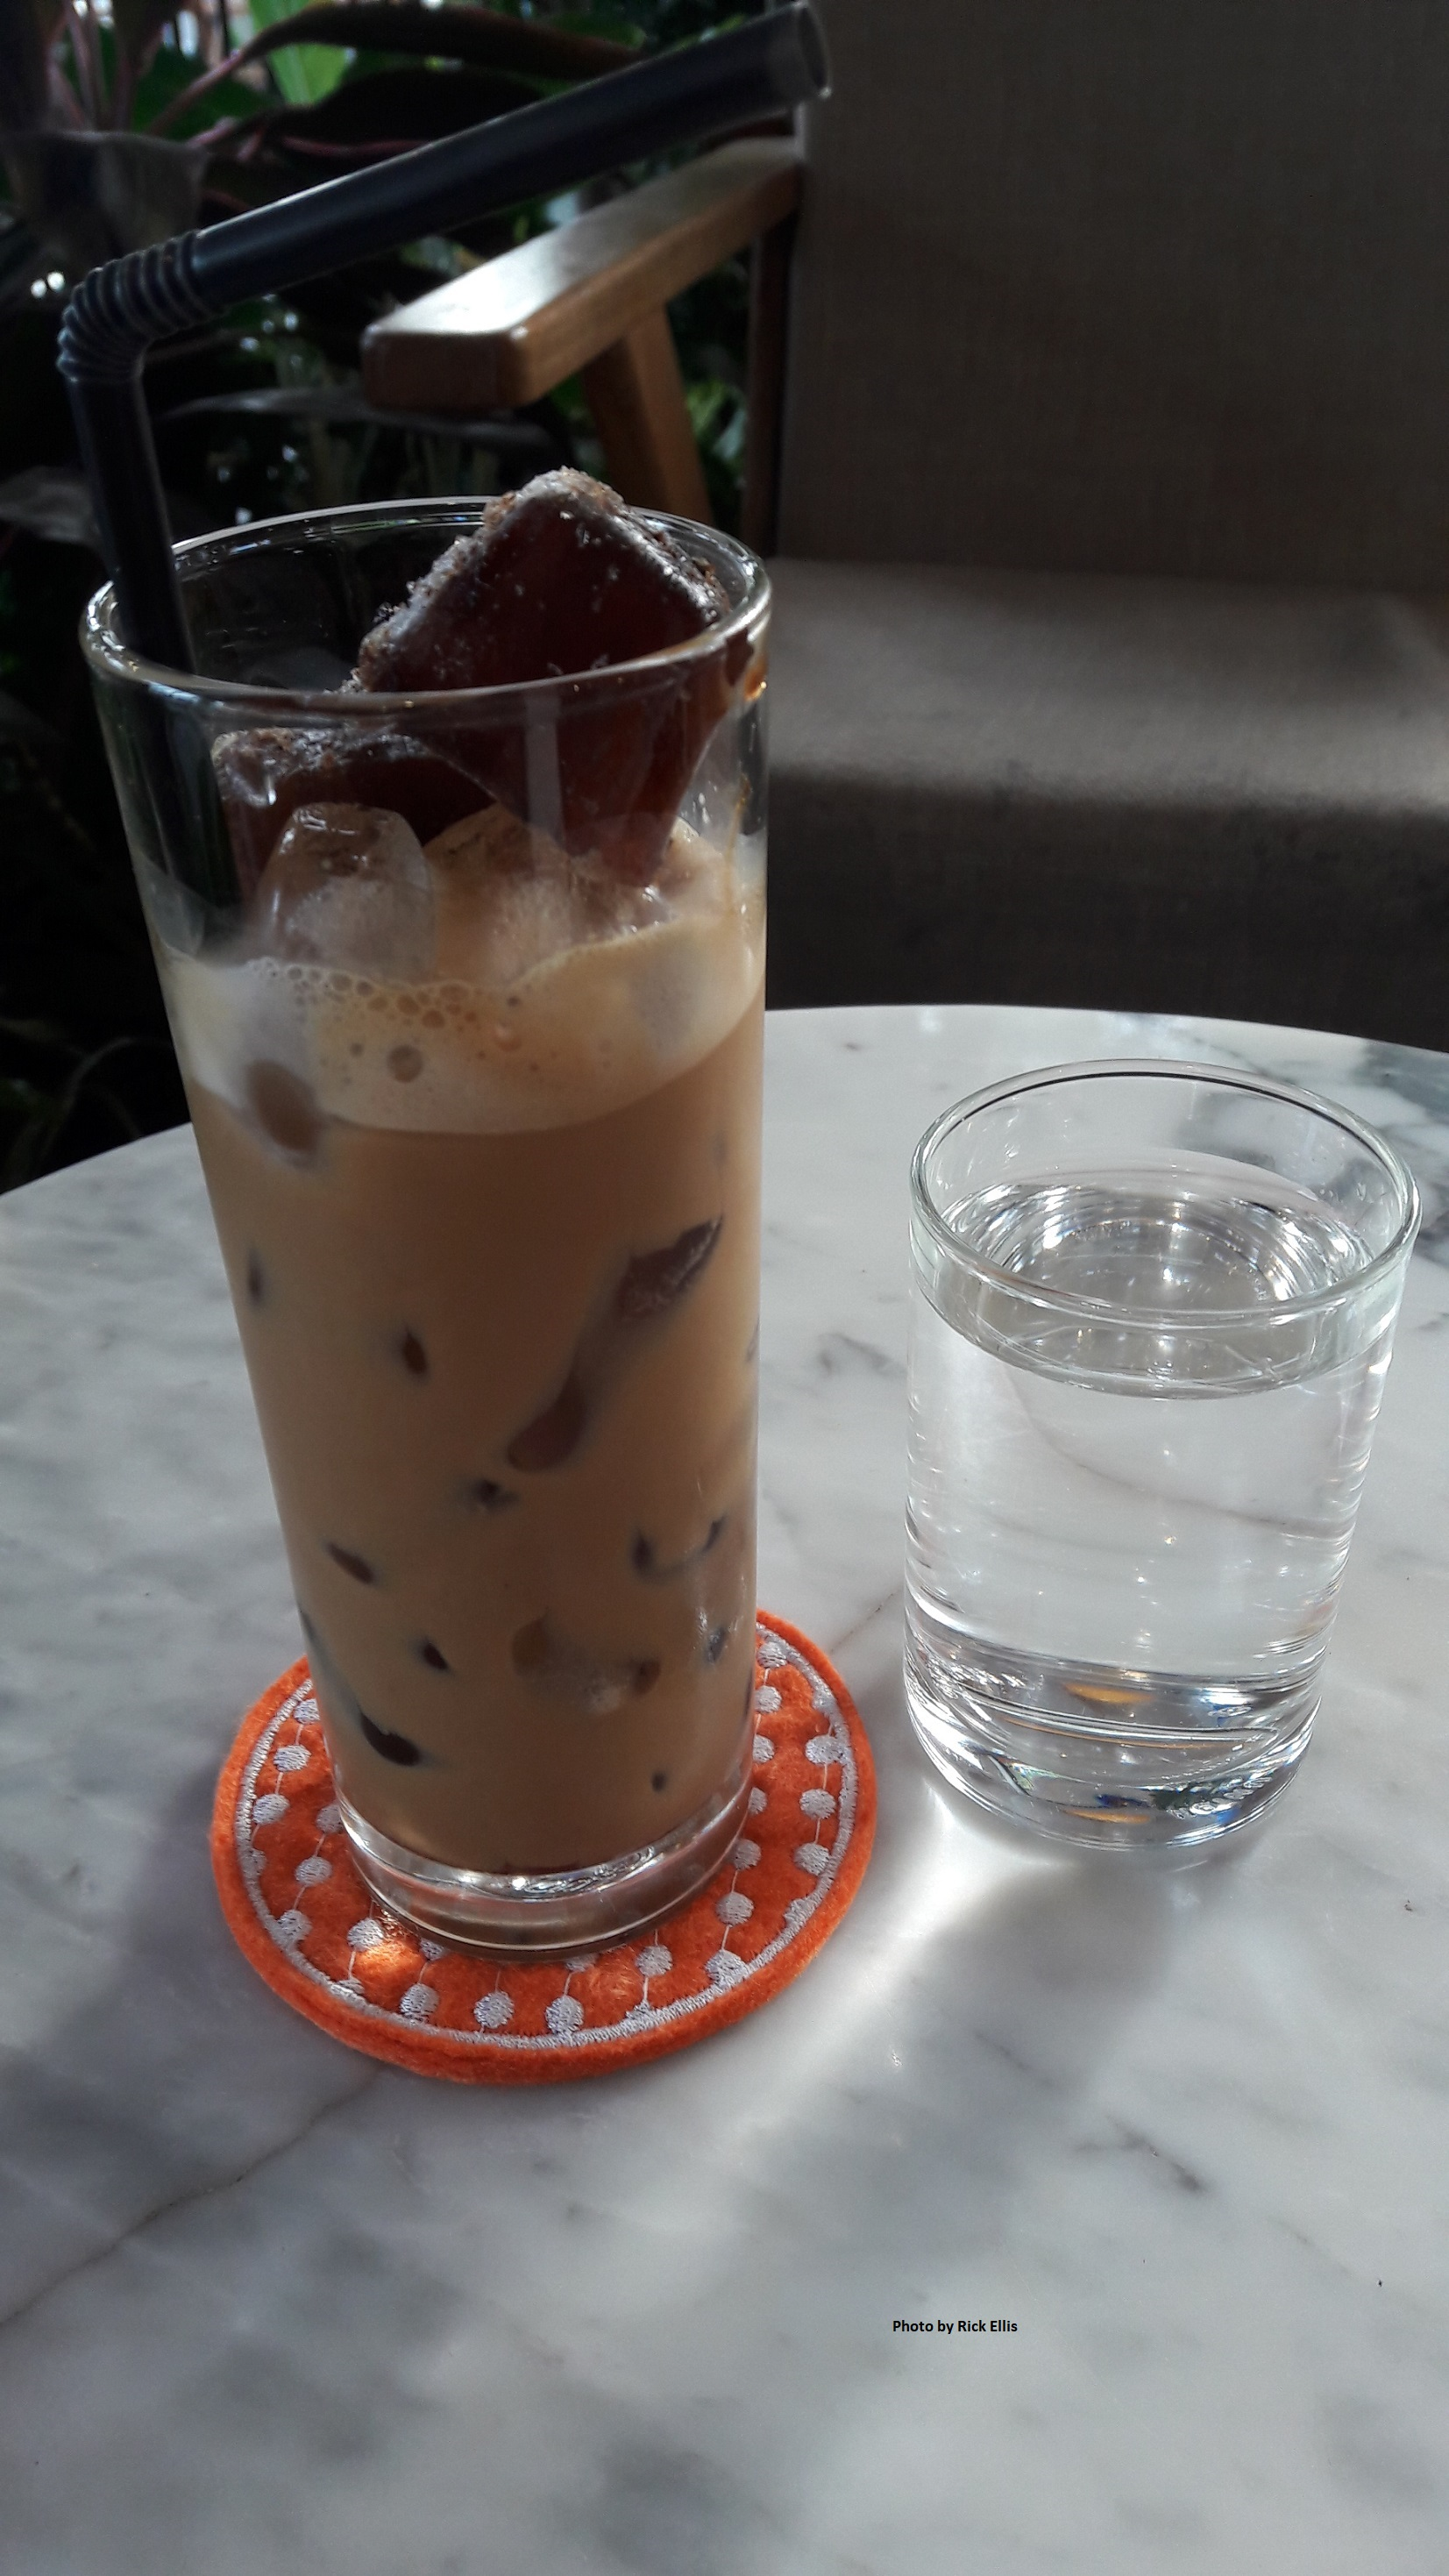 'Ca phe sua da' – Vietnamese milky iced coffee